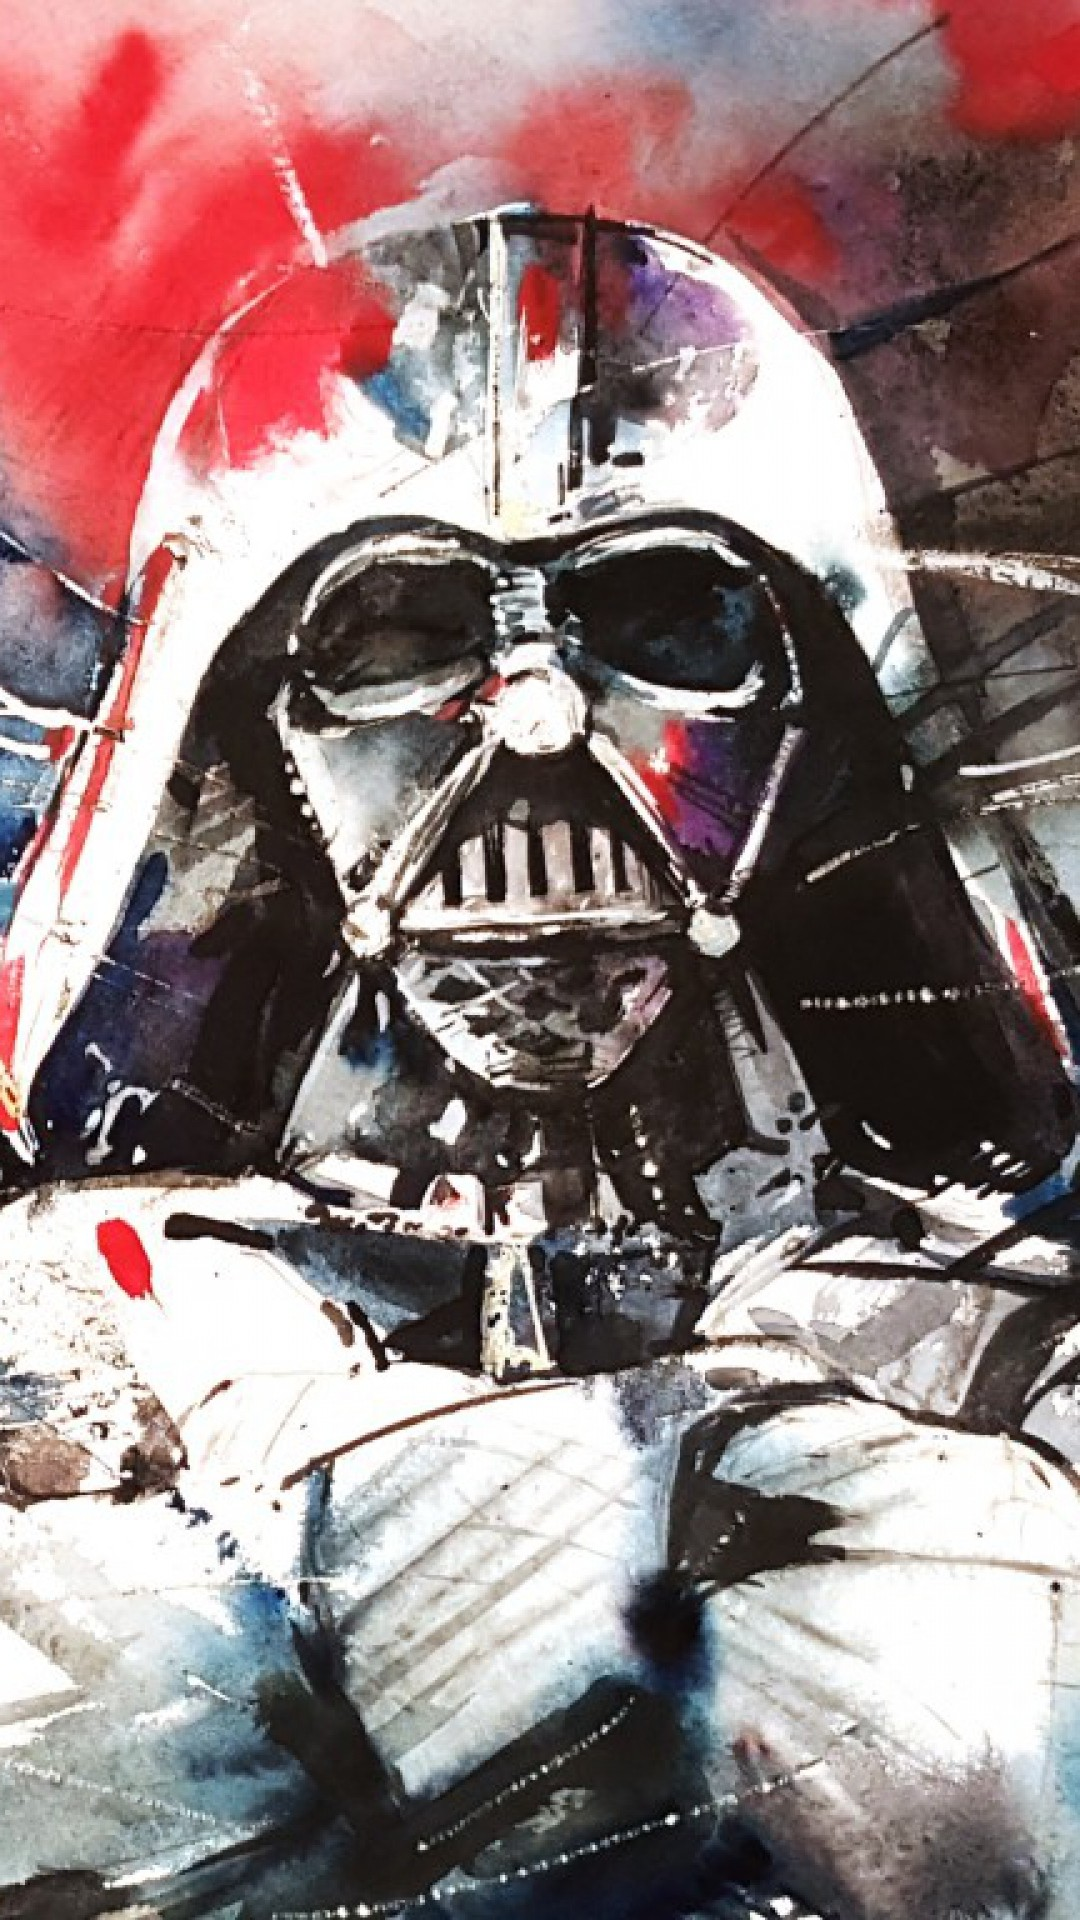 Darth Vader Star Wars Abstraction – Tap to see more exciting Star Wars  wallpaper! @